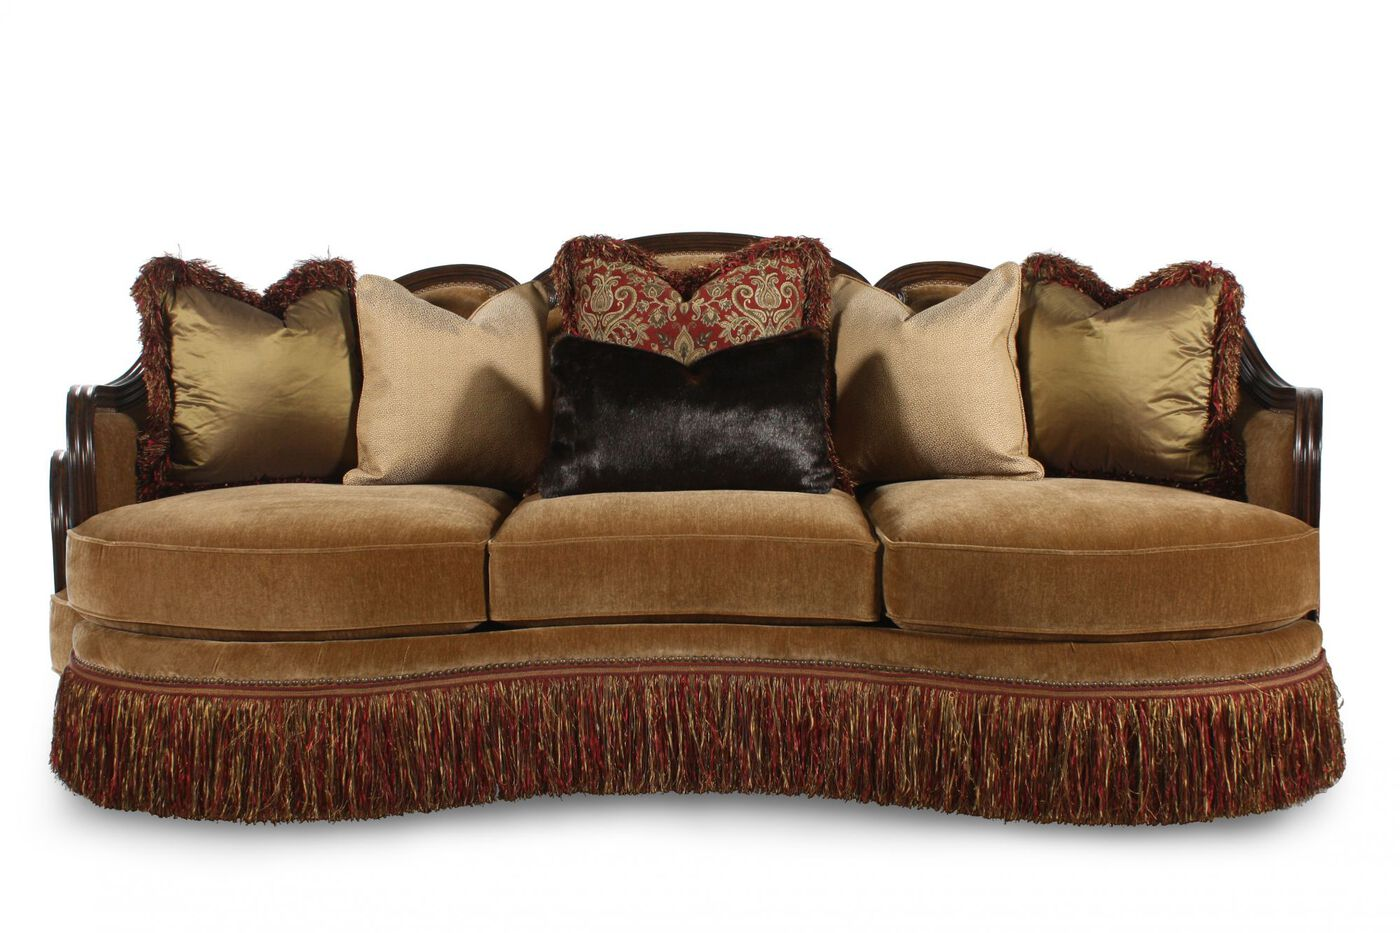 Sofas With Wood Trim Sofa Wood Trim Rifpro Org